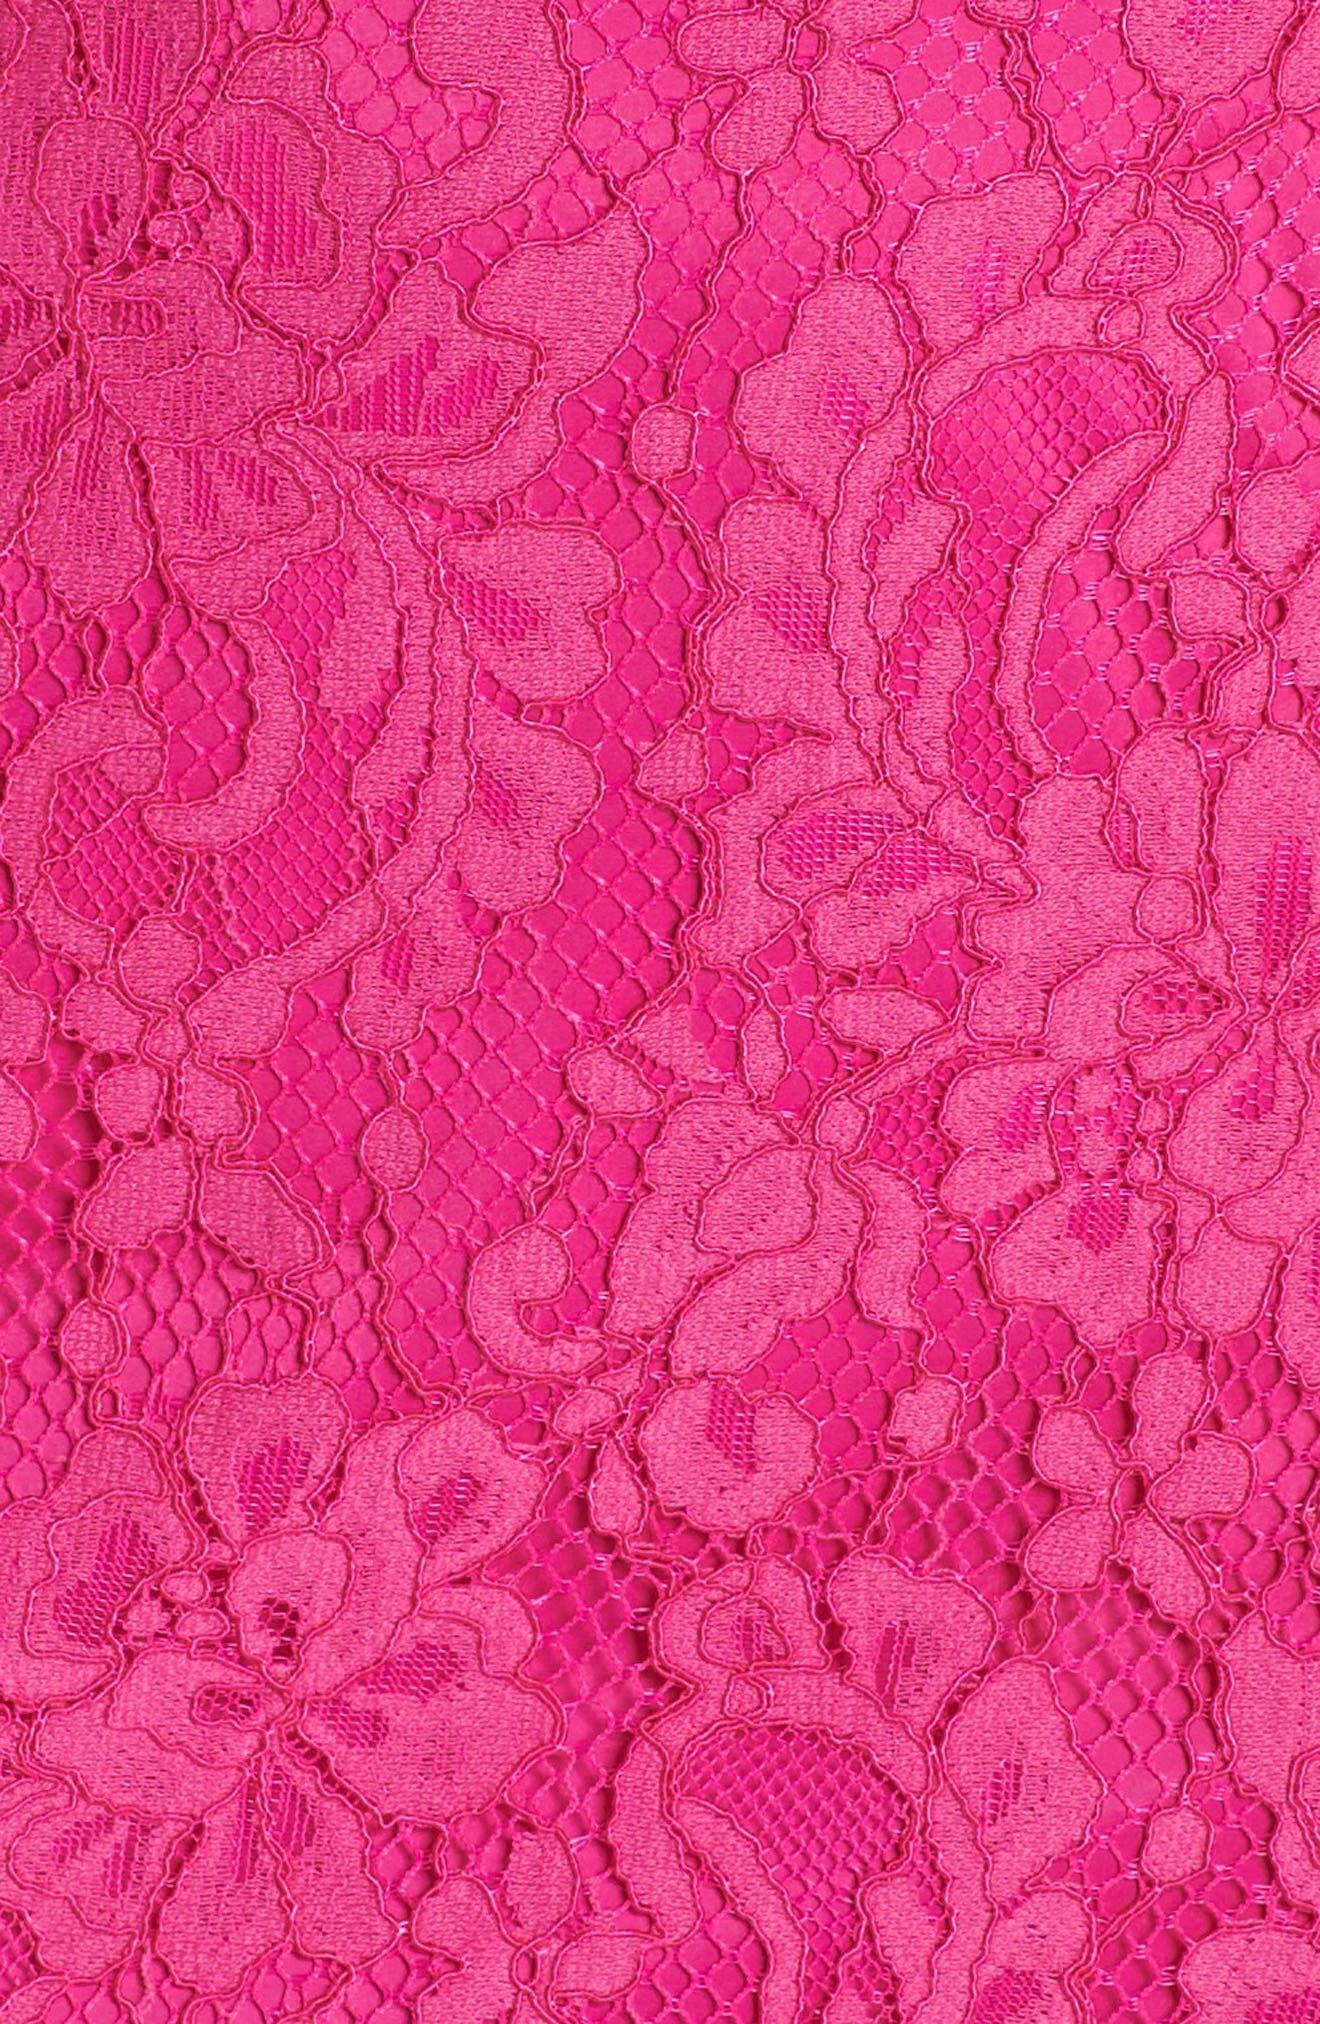 Azul Scallop Hem Off the Shoulder Lace Dress,                             Alternate thumbnail 6, color,                             BRILLIANT FUCHSIA